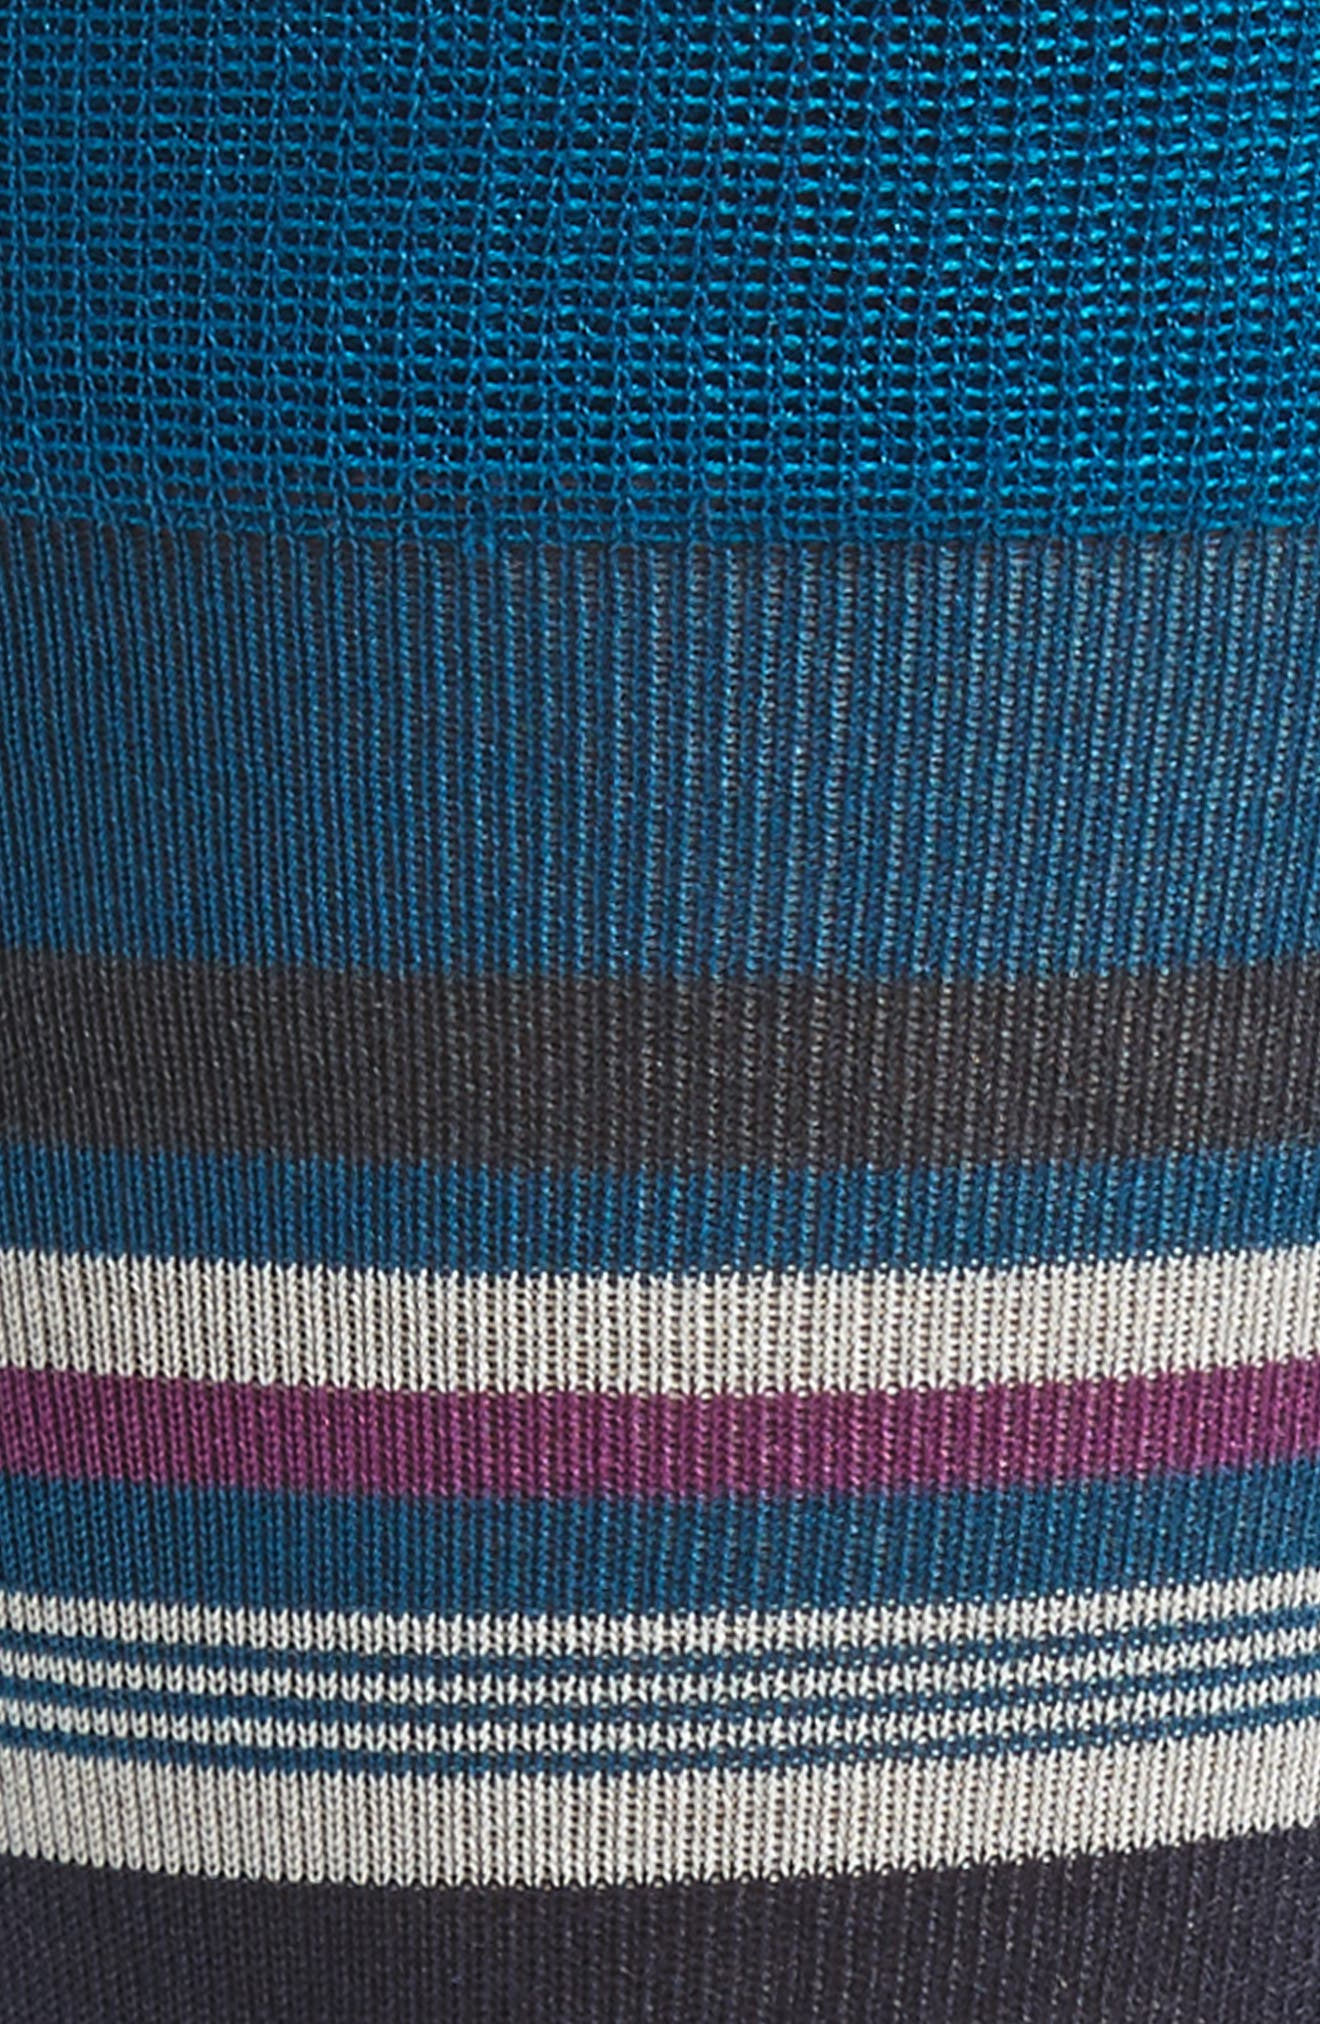 Stripe Socks,                             Alternate thumbnail 2, color,                             440